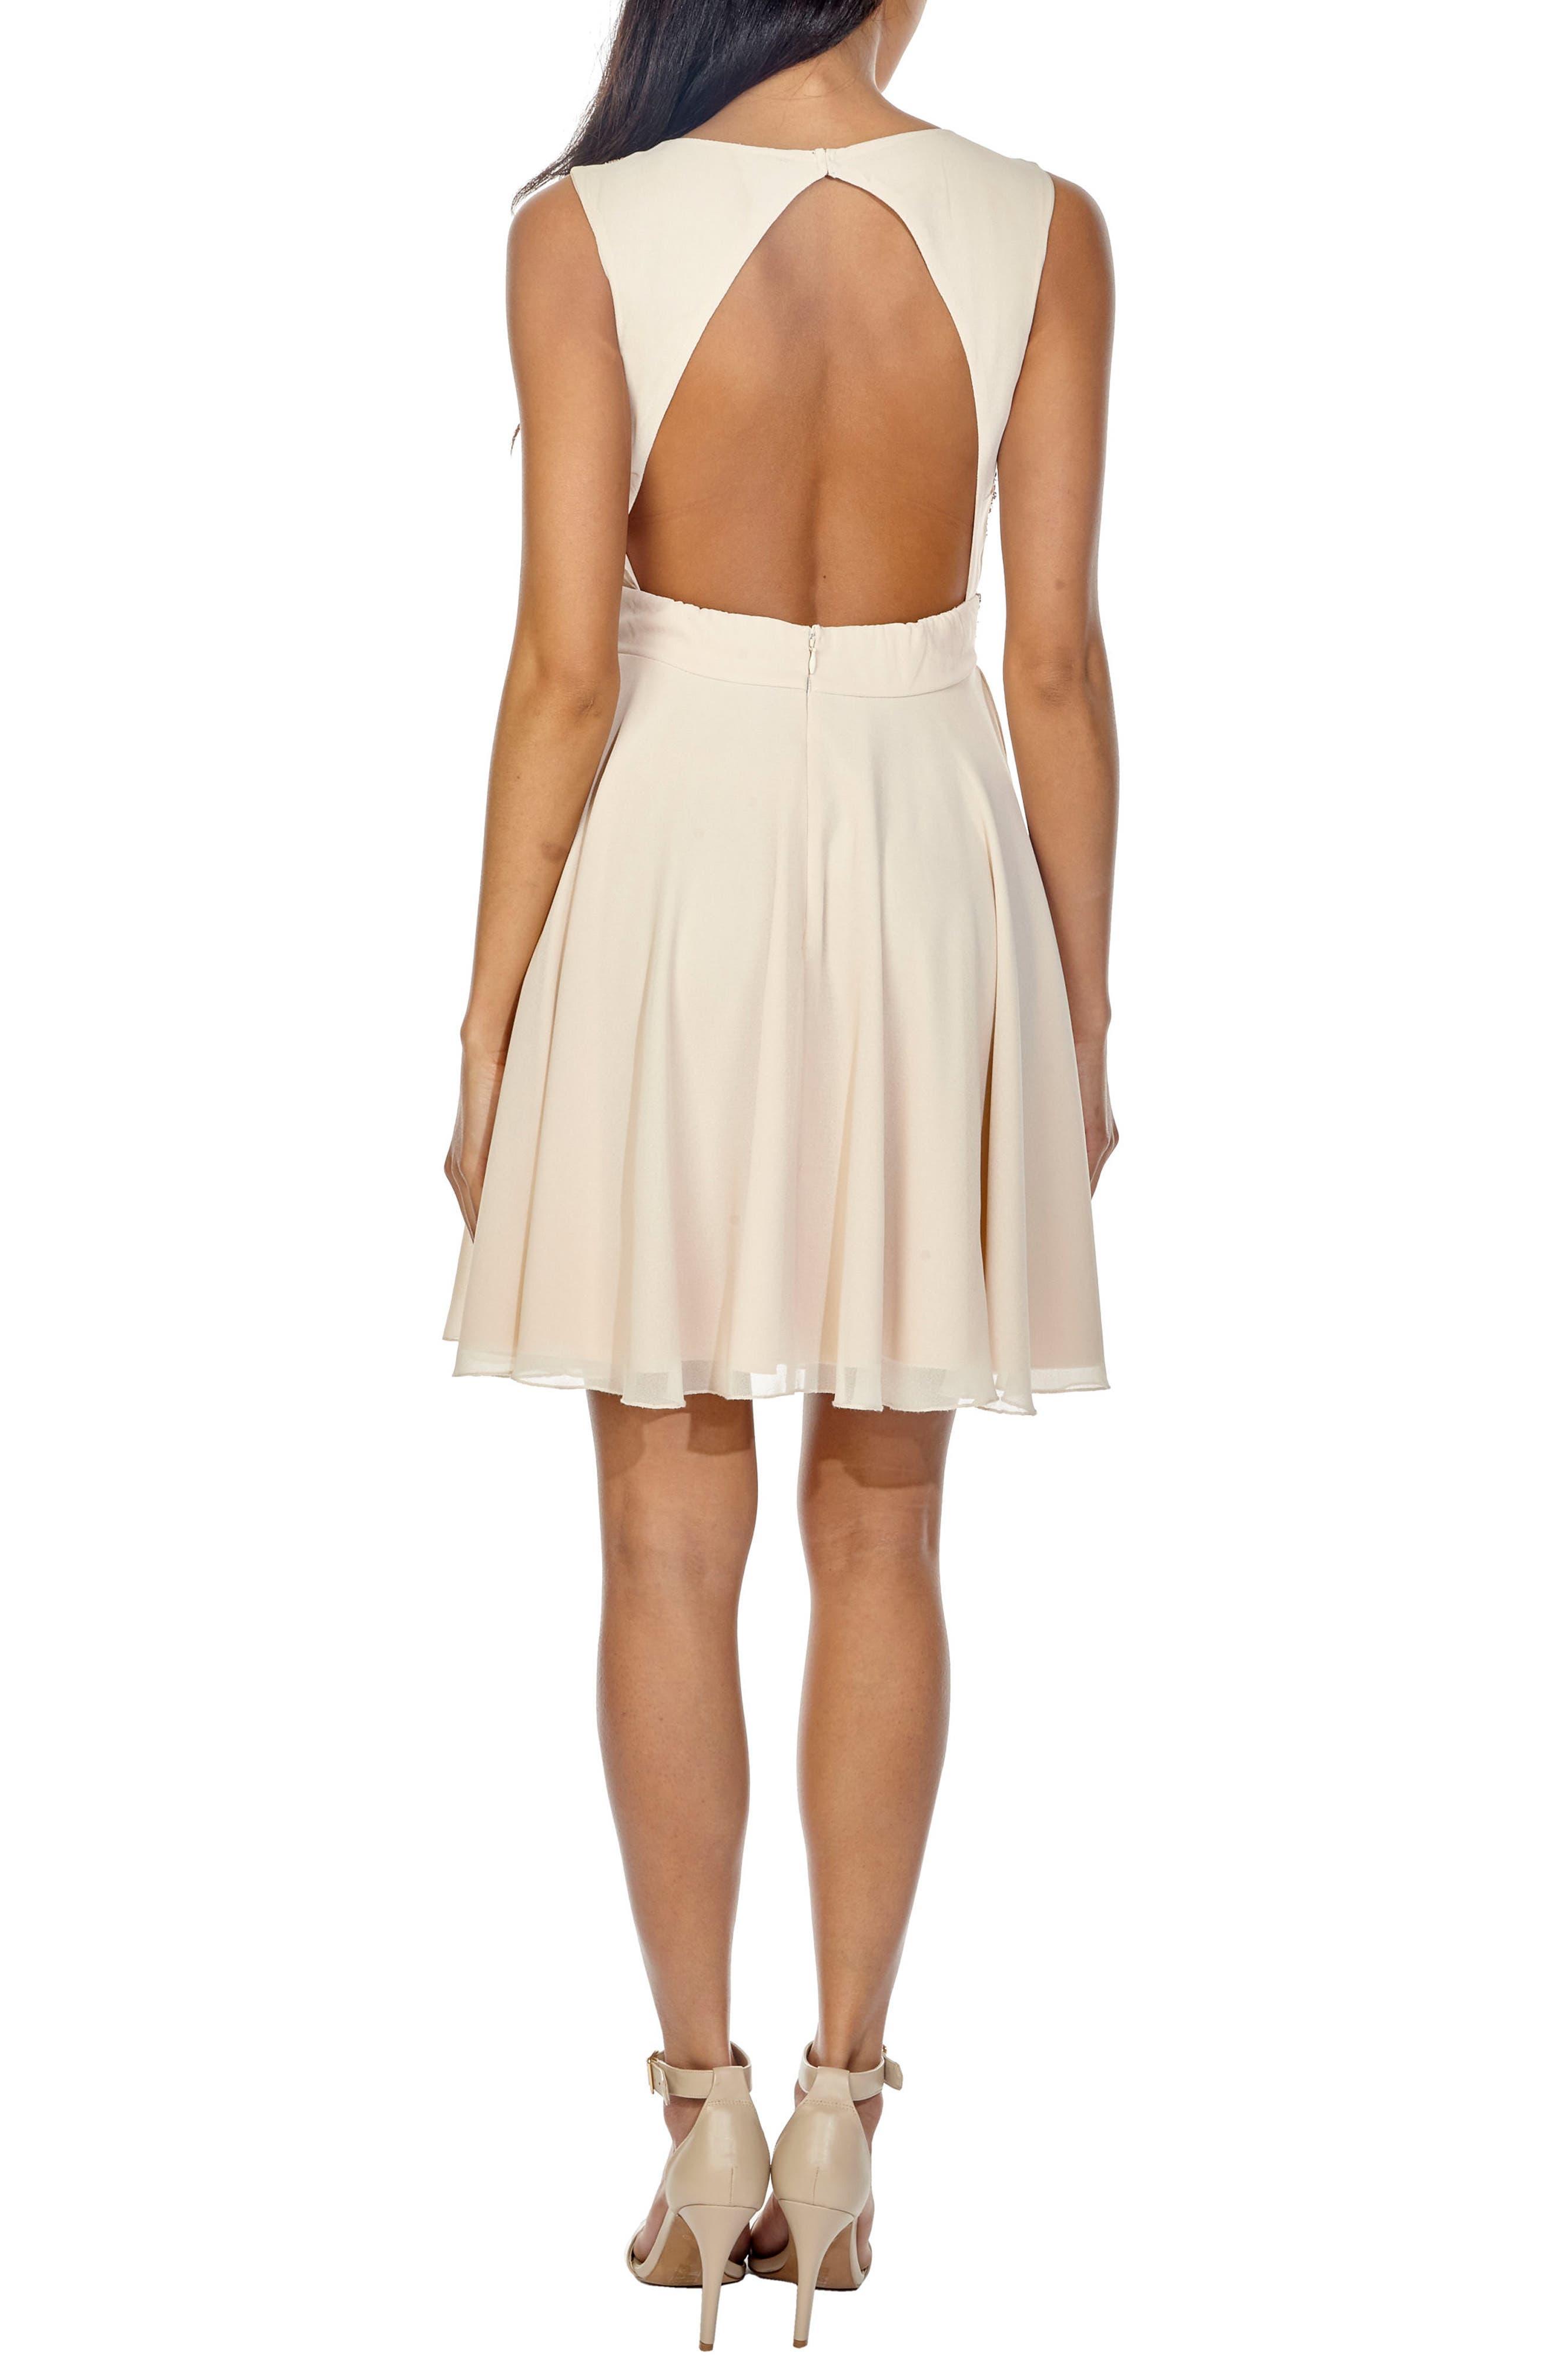 Corals Sequin Back Cutout Dress,                             Alternate thumbnail 3, color,                             Cream